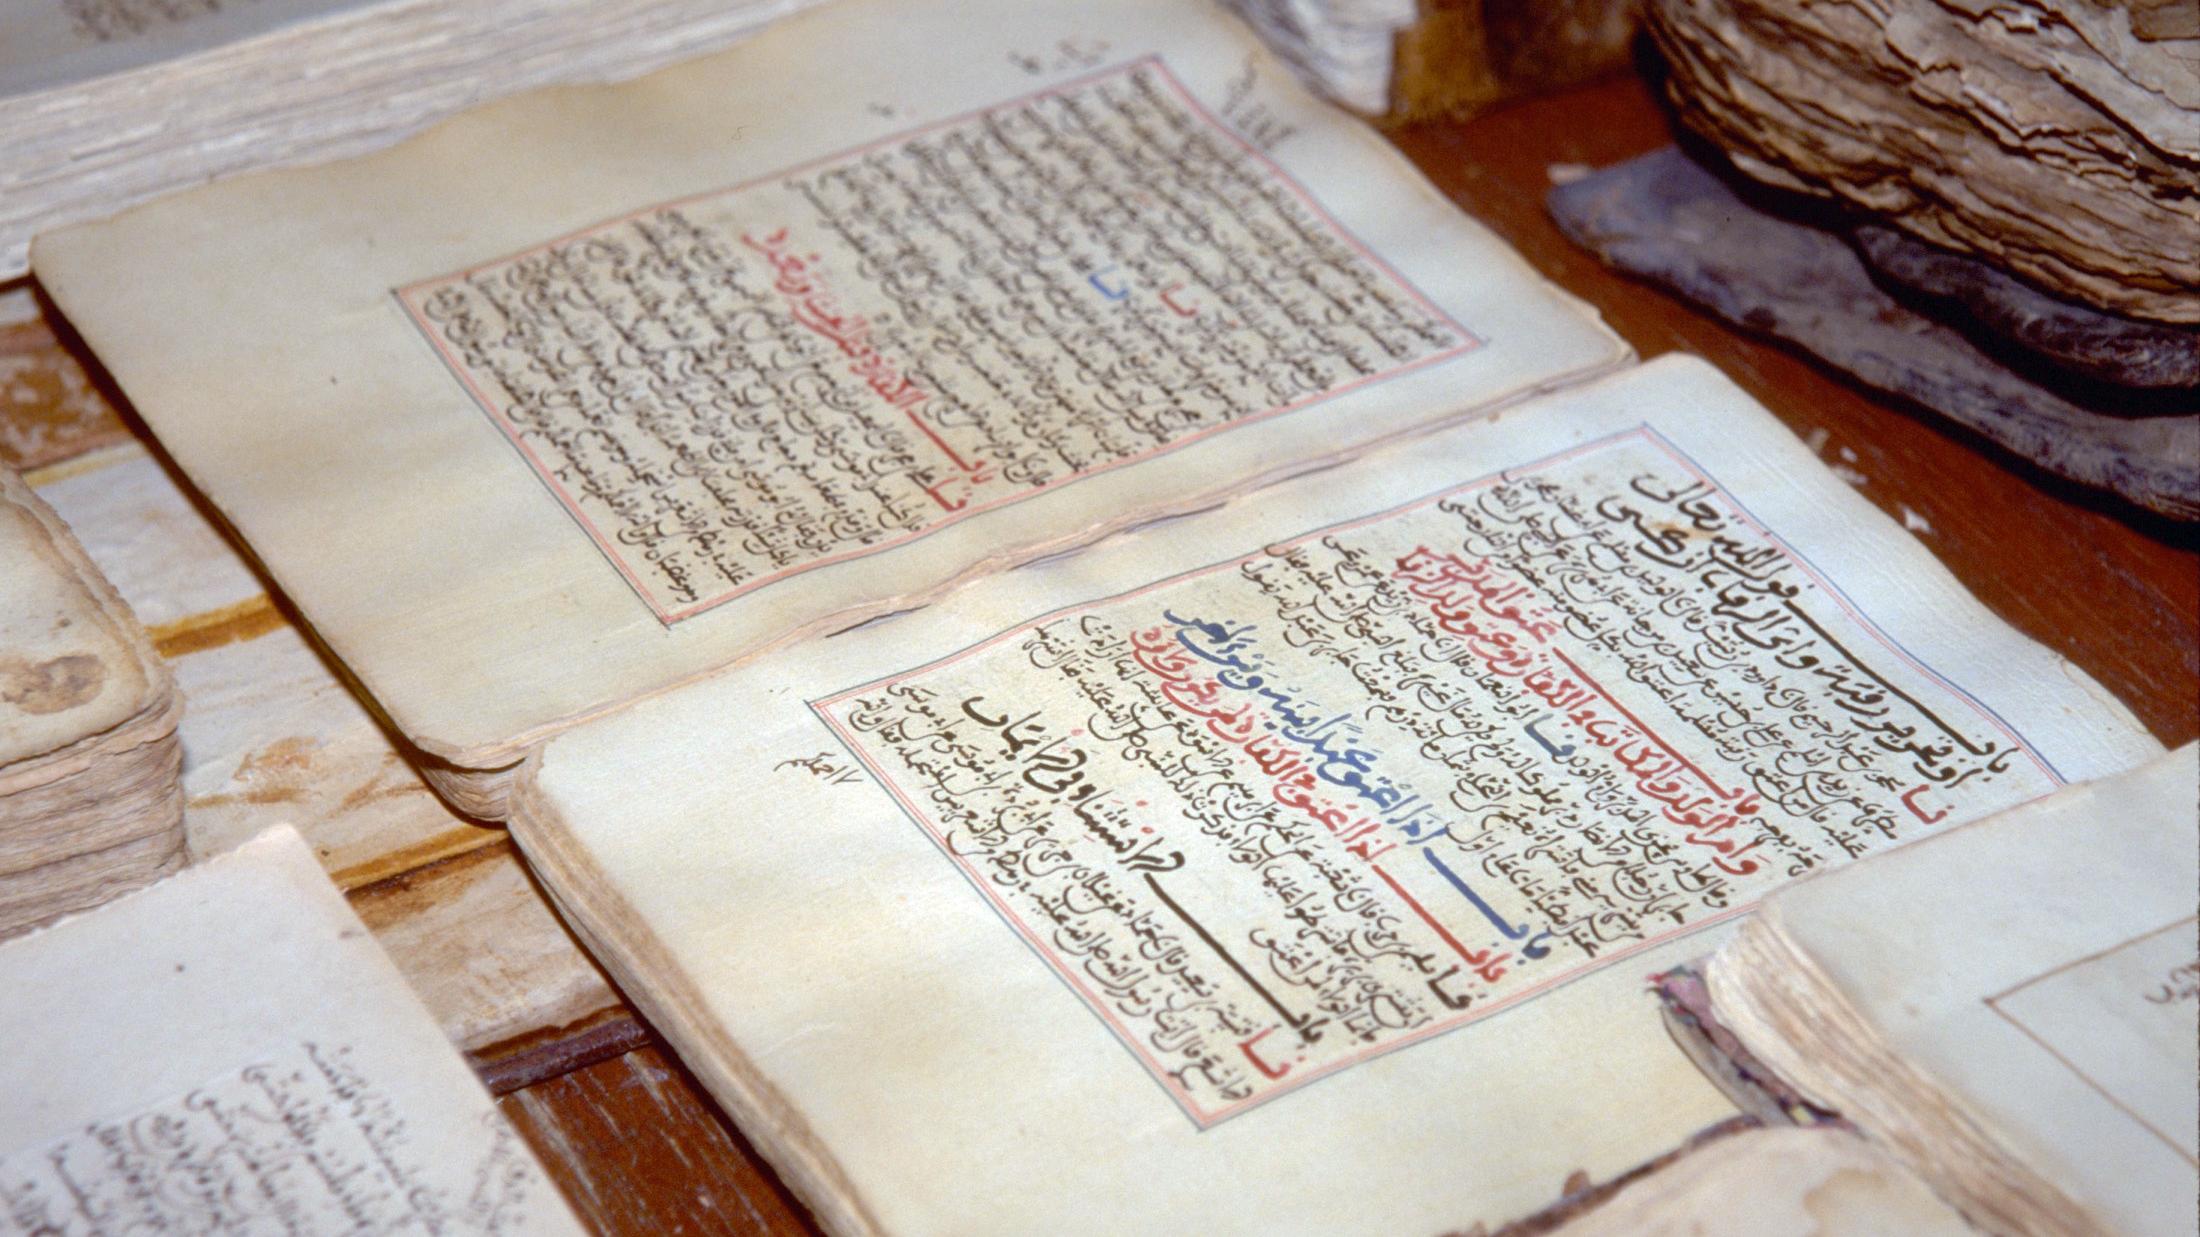 Timbuktu's 'Badass Librarians': Checking Out Books Under Al-Qaida's Nose